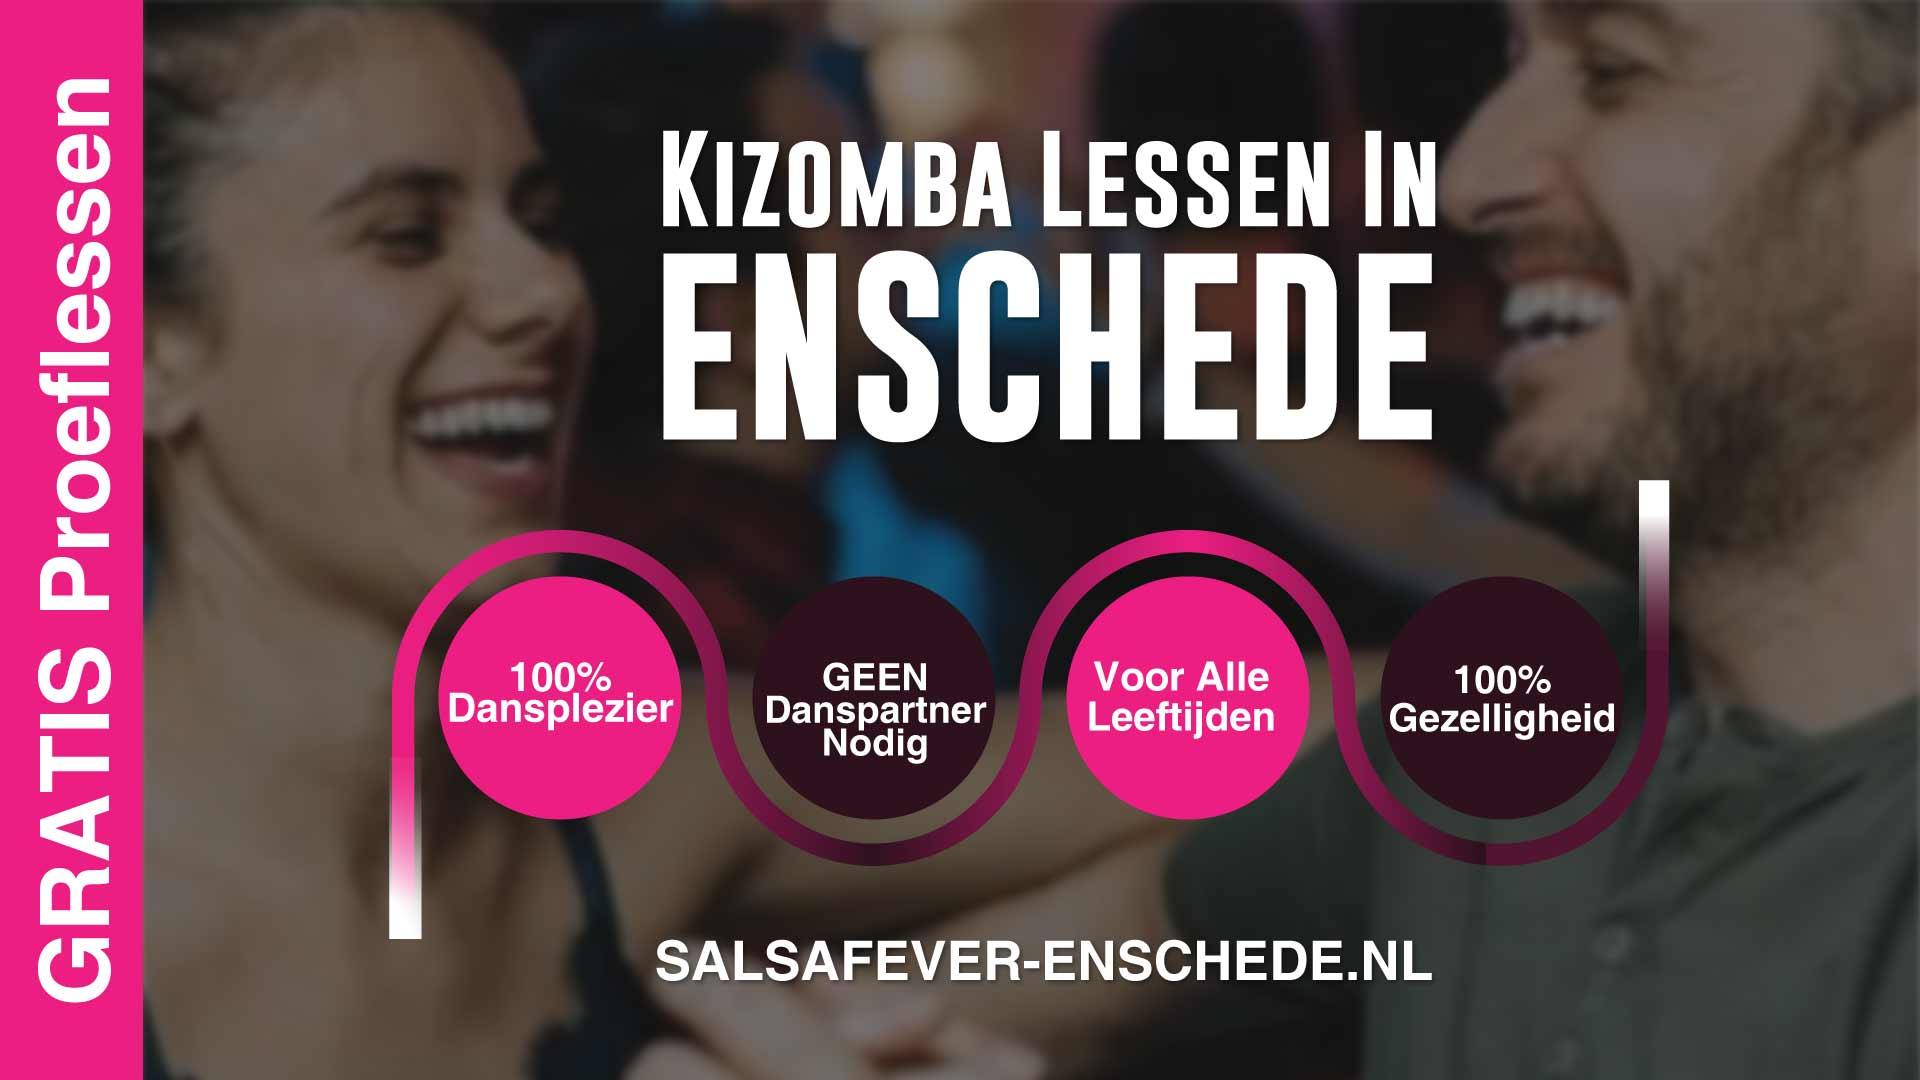 Kizomba-enschede-Kizomba Enschede Kizomba Danslessen Kizomba lessen Kizomba lessen Enschede